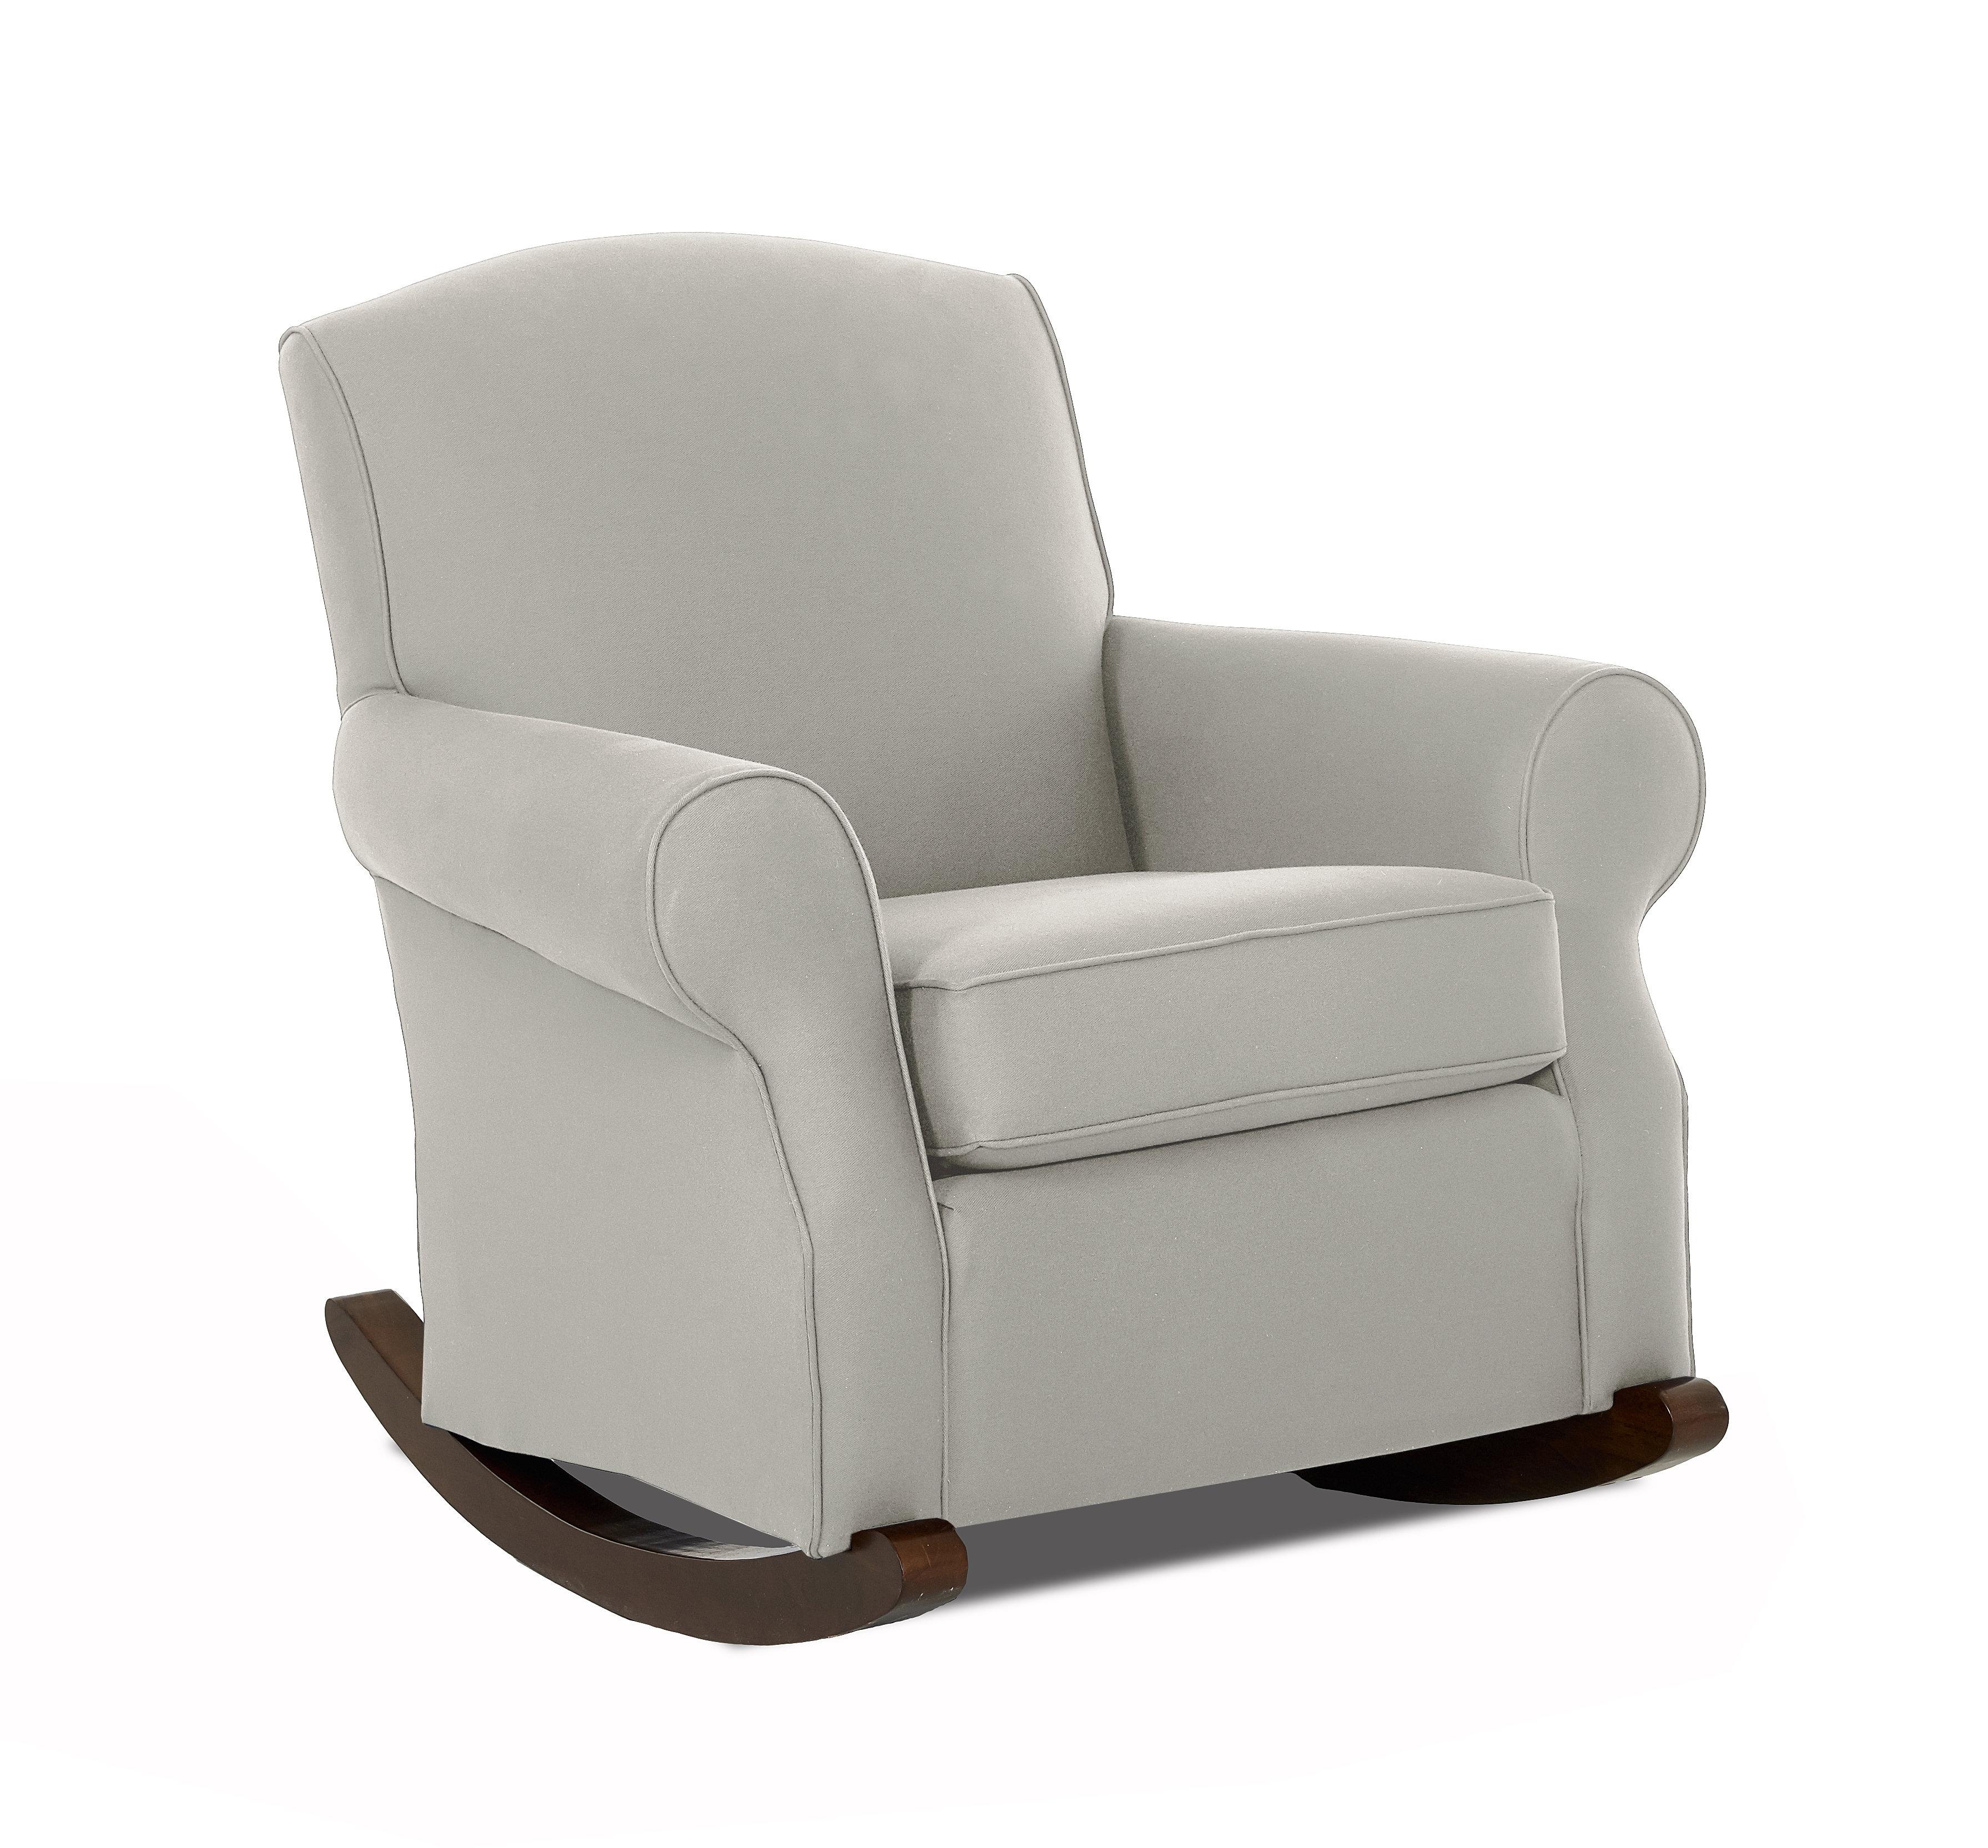 Wayfair Custom Upholstery™ Marlowe Rocking Chair | Wayfair Pertaining To Katrina Grey Swivel Glider Chairs (View 3 of 25)